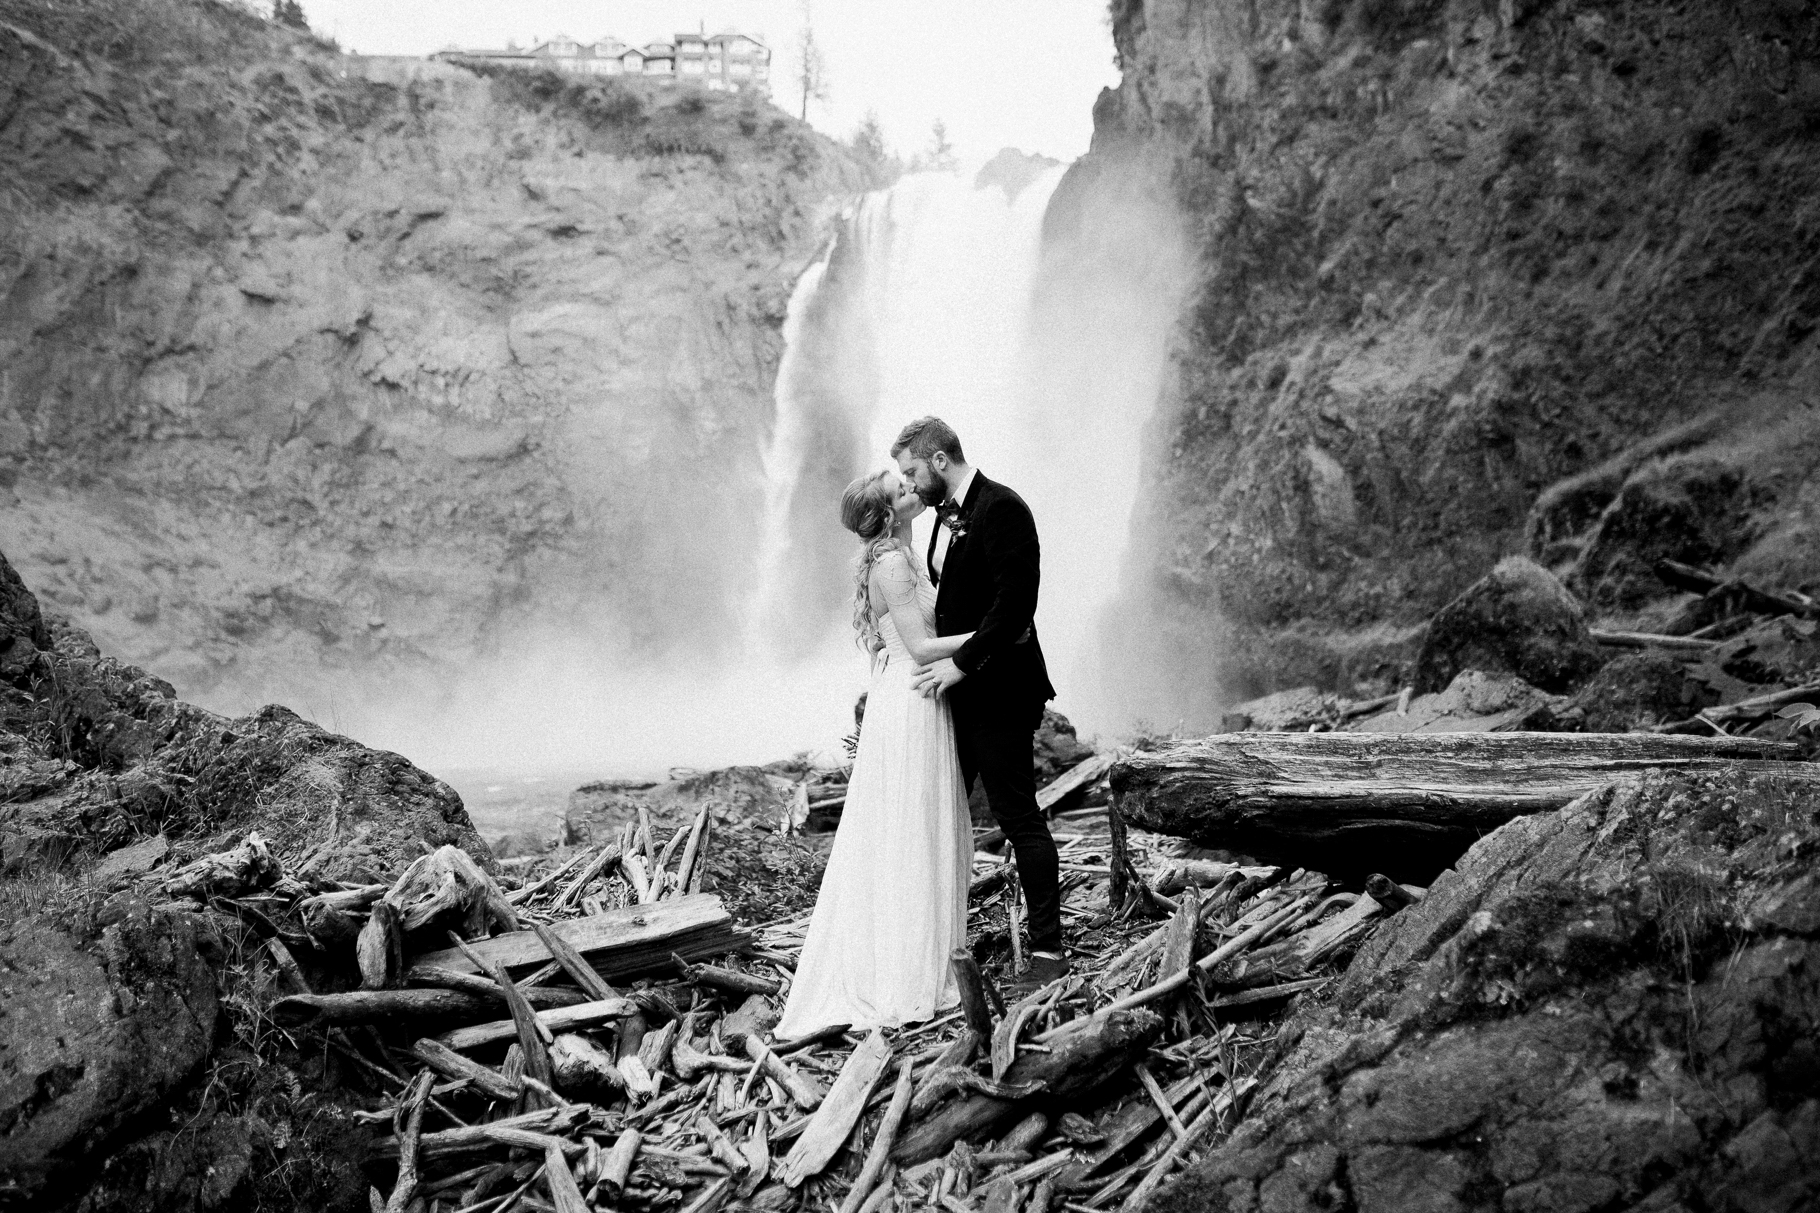 21-Adventure-Elopement-Waterfall-Seattle-Wedding-Photographer-Snoqualmie-Falls-Hike